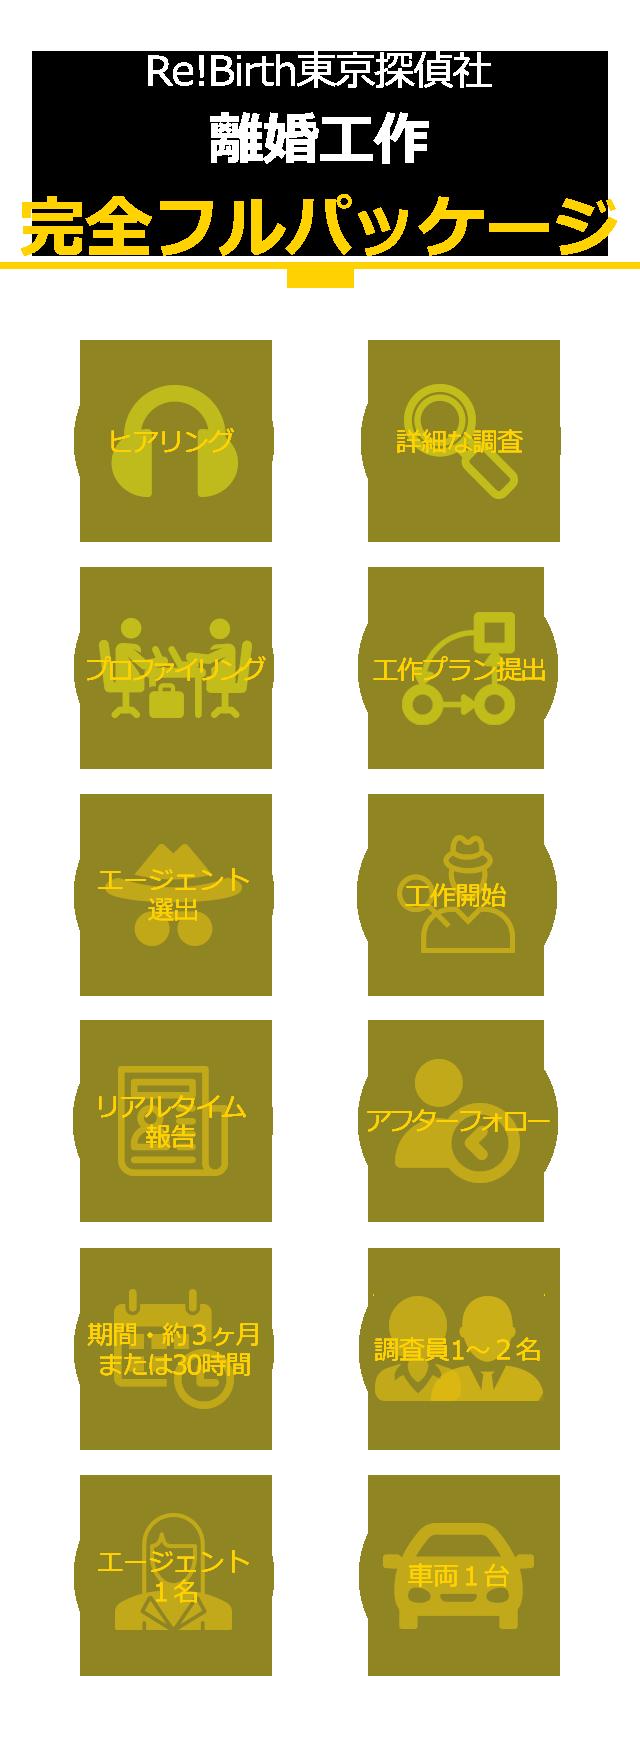 Re!Birth東京探偵社 離婚工作/完全フルパッケージ